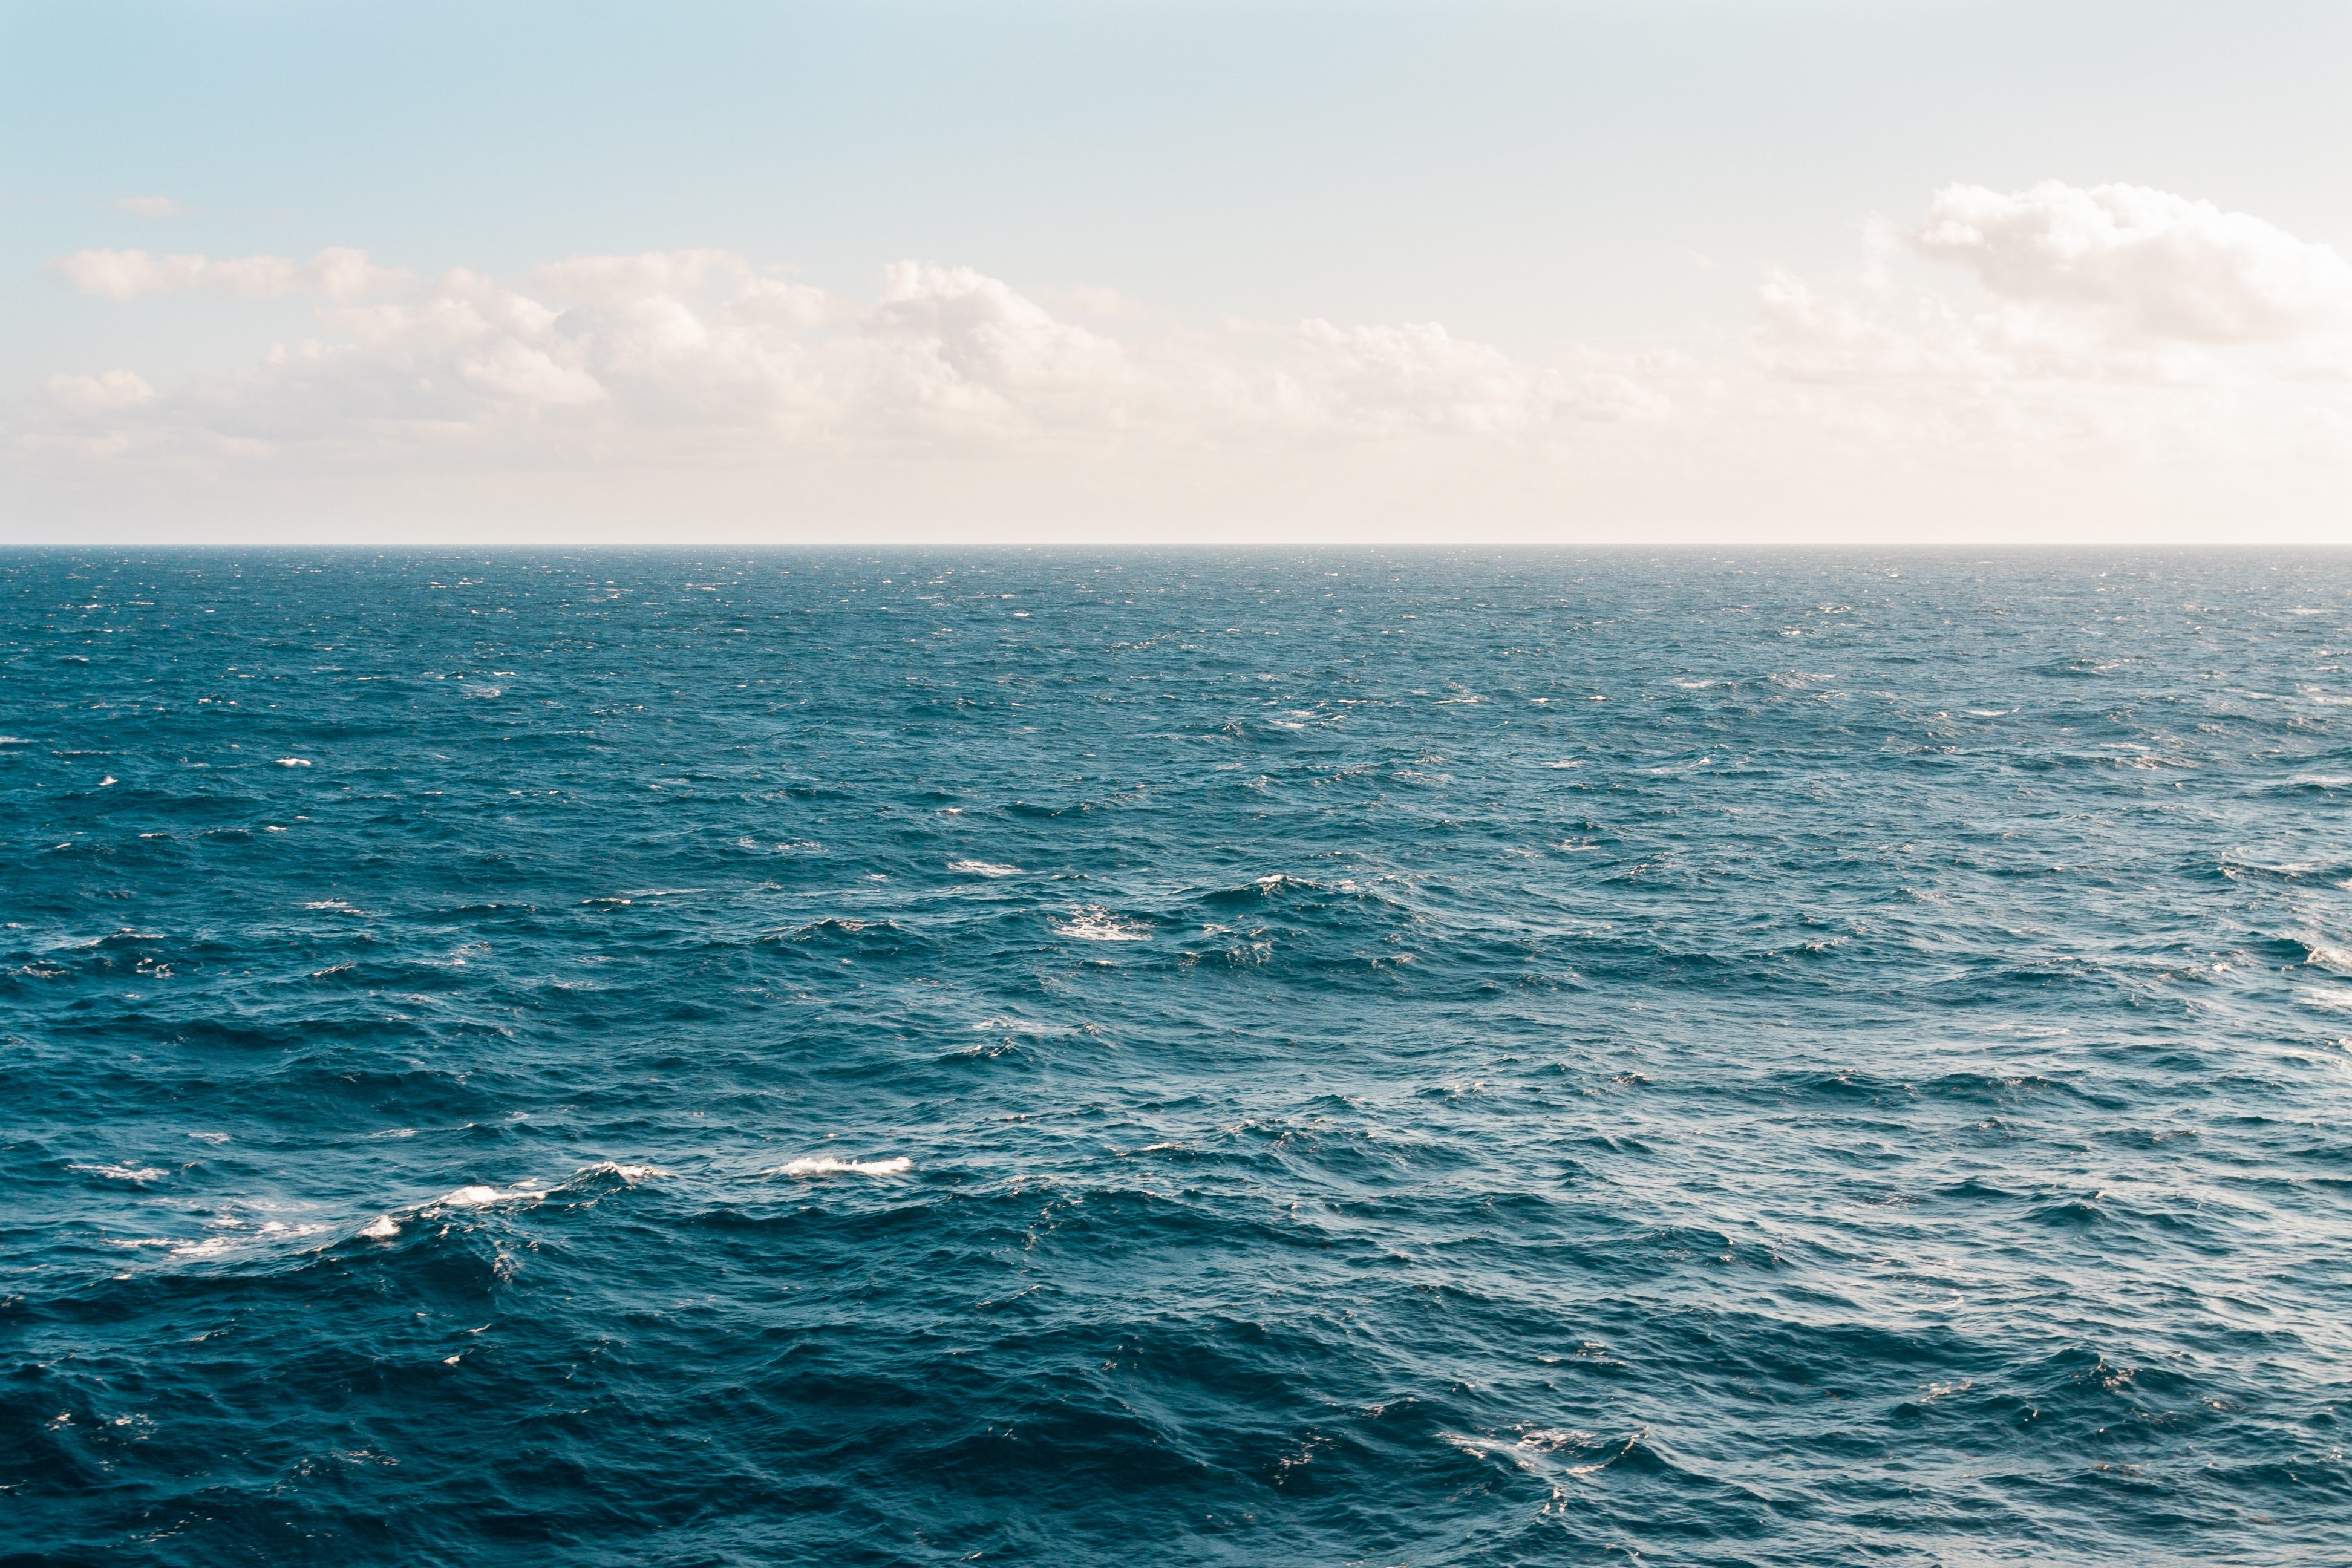 Ocean Waves And Sunny Sky